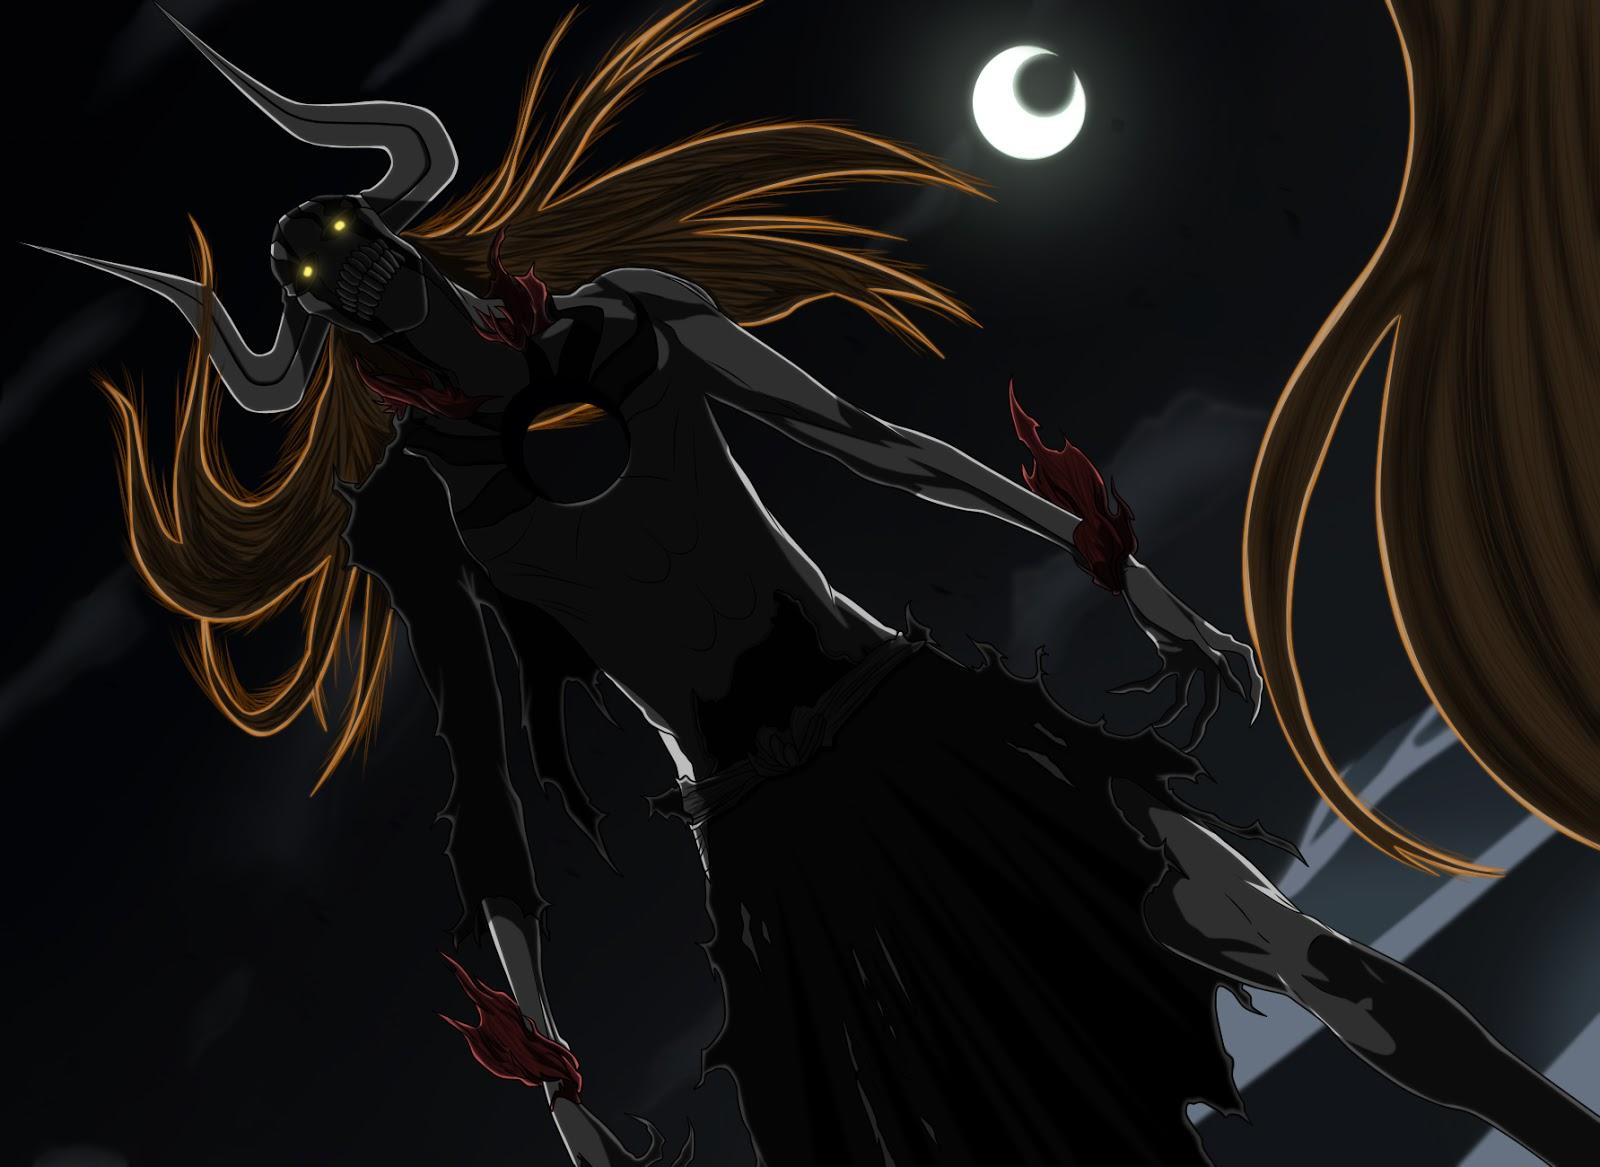 Itachi Quotes Wallpaper Hd Kurosaki Ichigo Vizard 7 Wallpapers Your Daily Anime